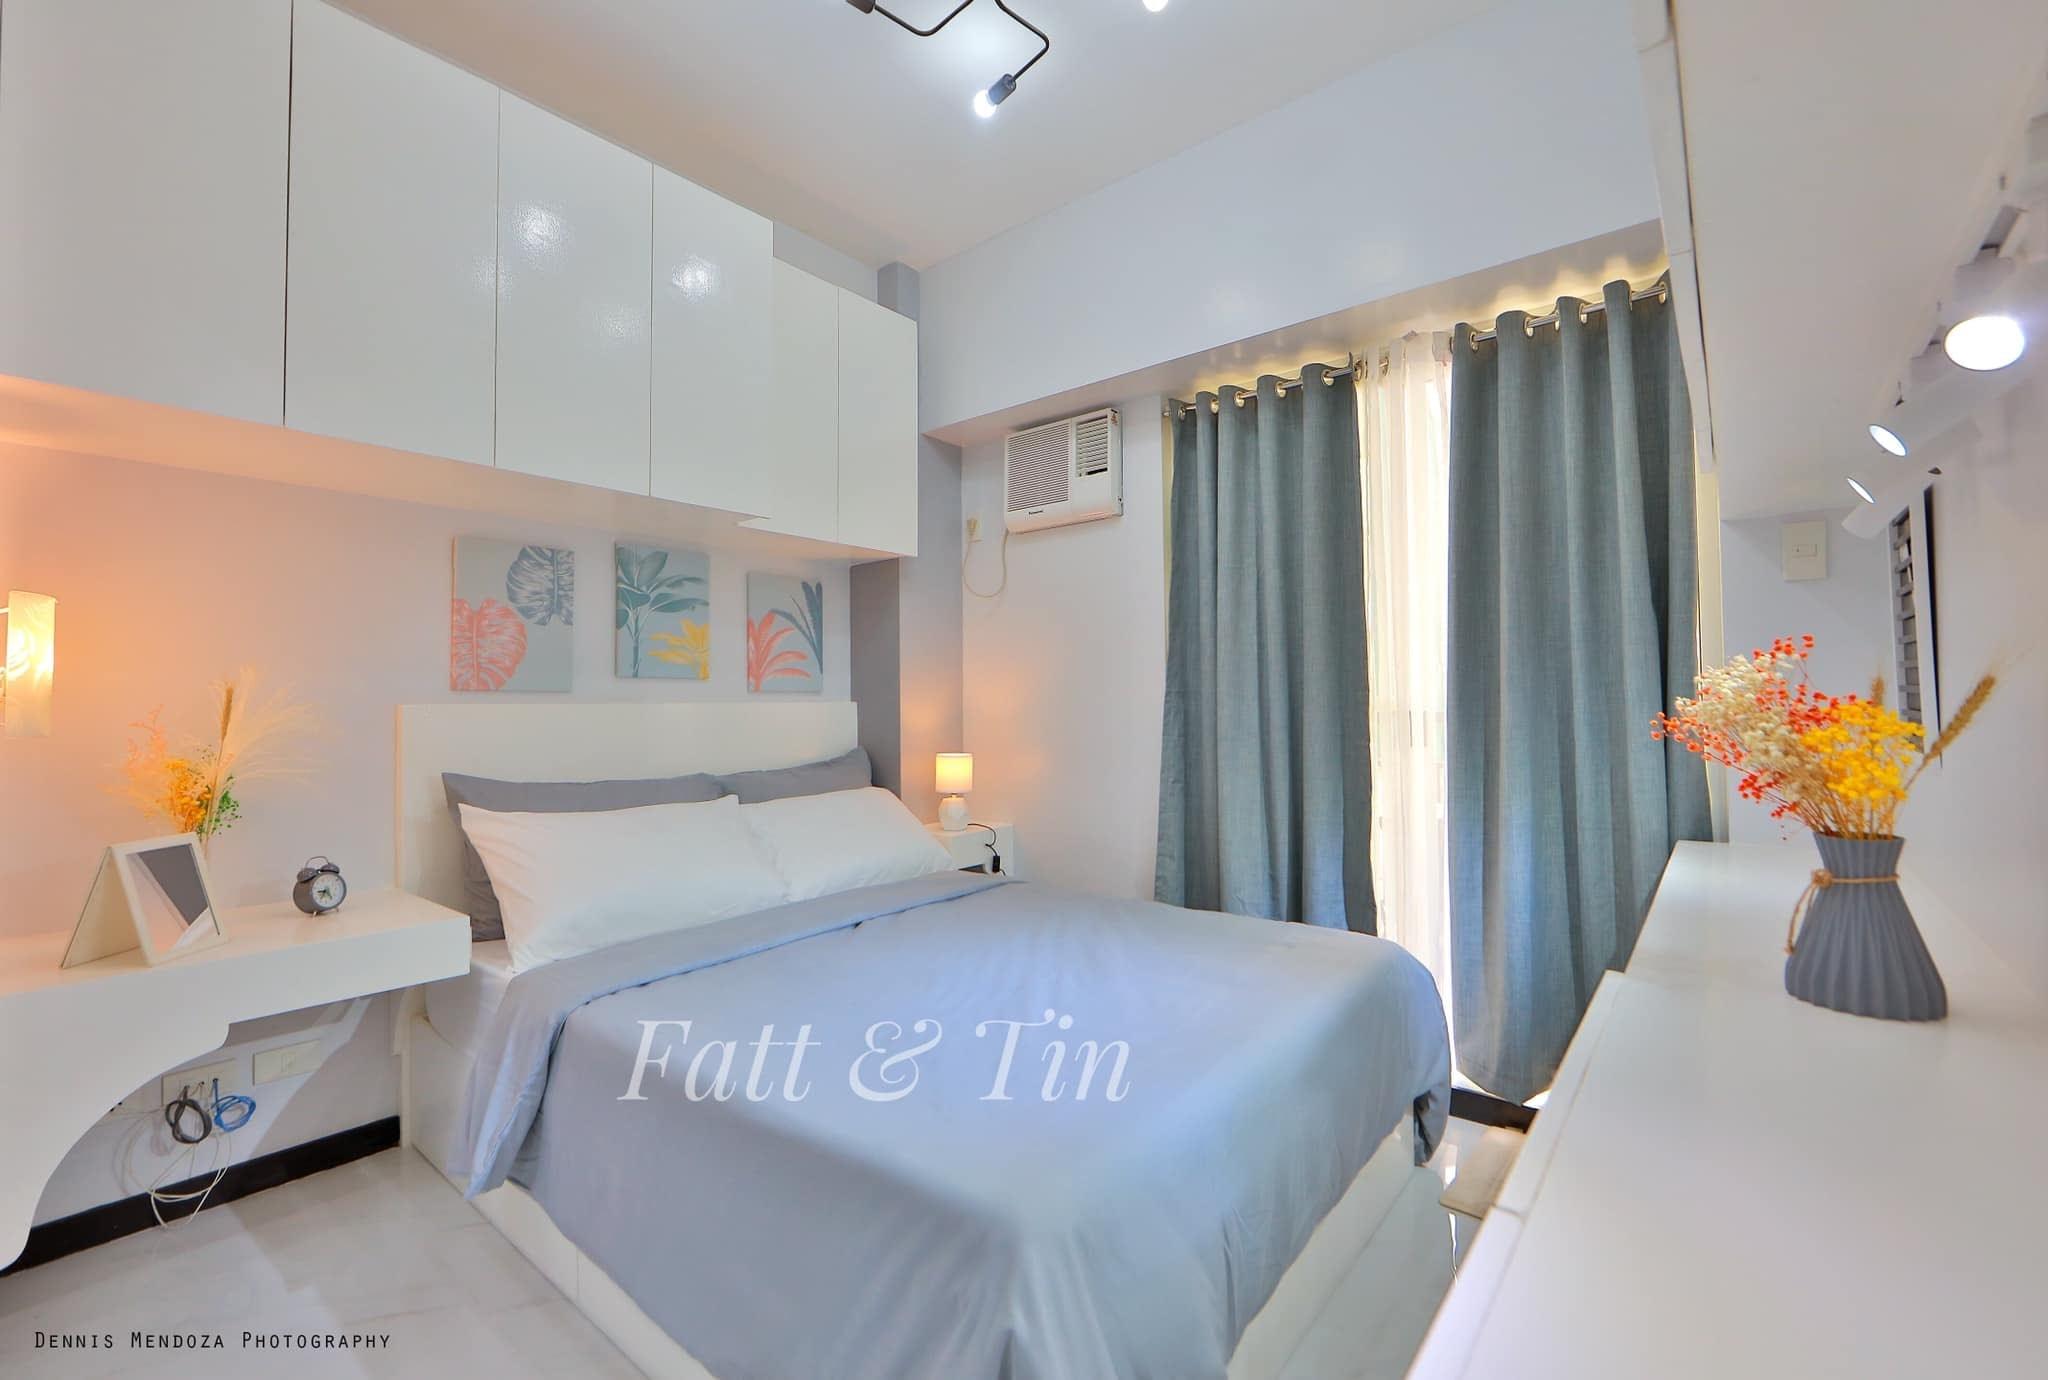 Sheridan Towers, DMCI Homes, Mandaluyong